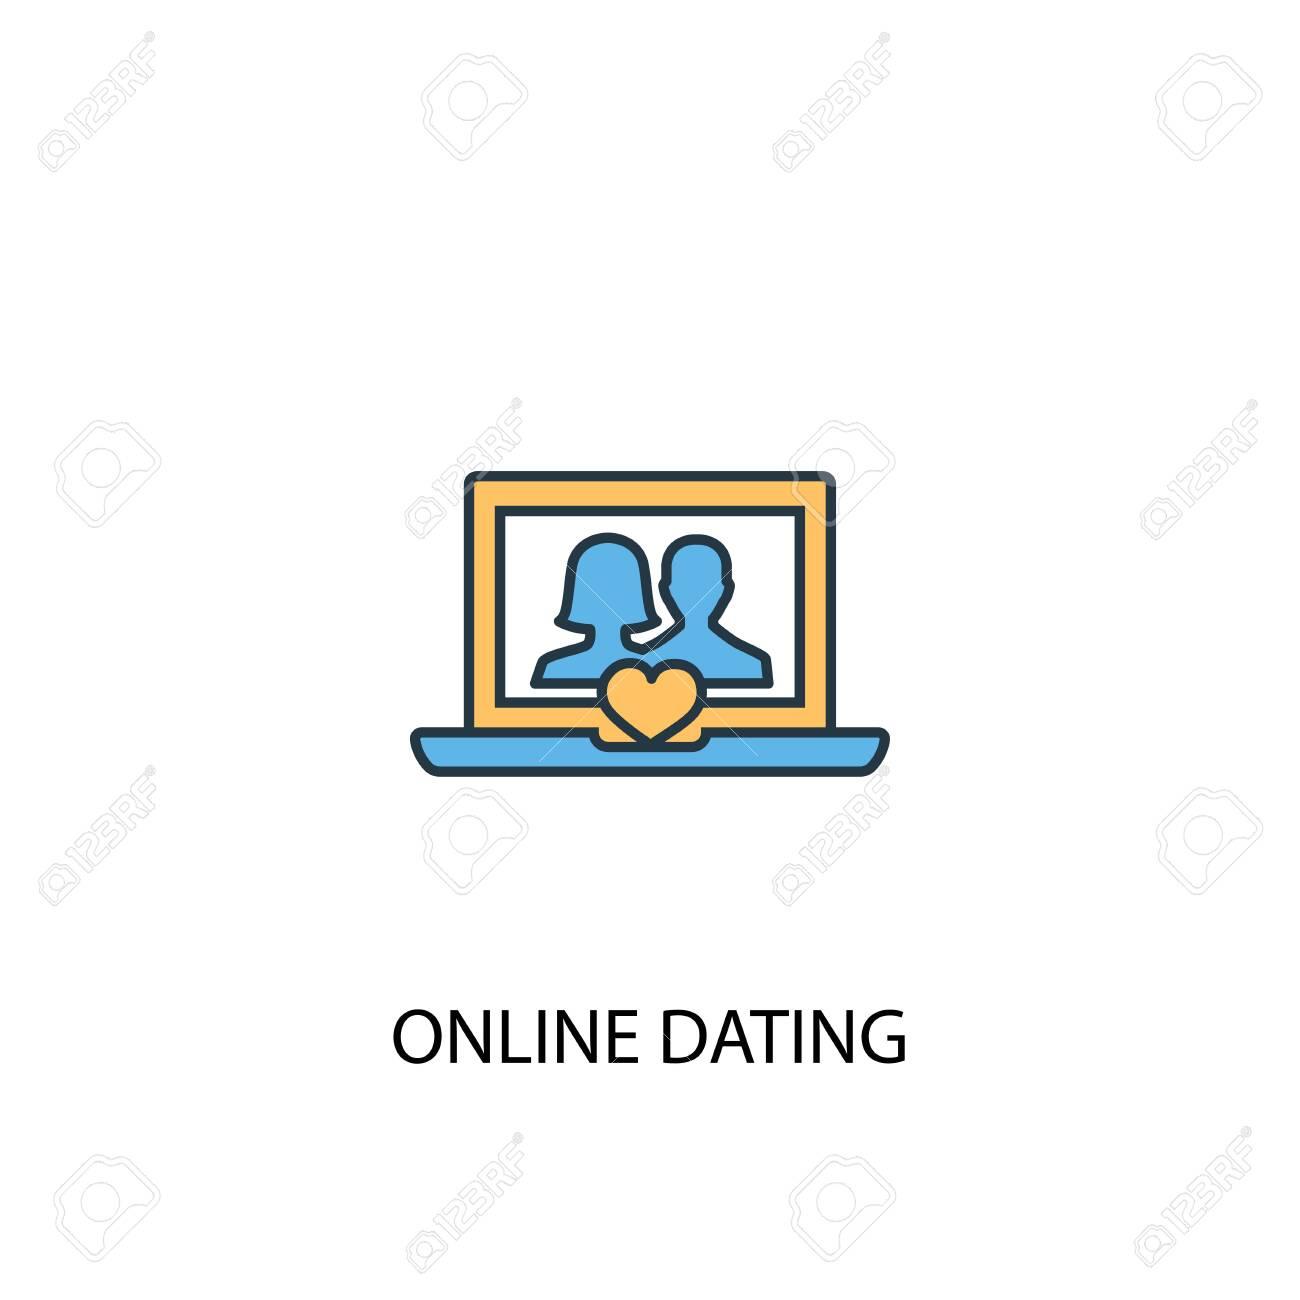 2. dátum online dating